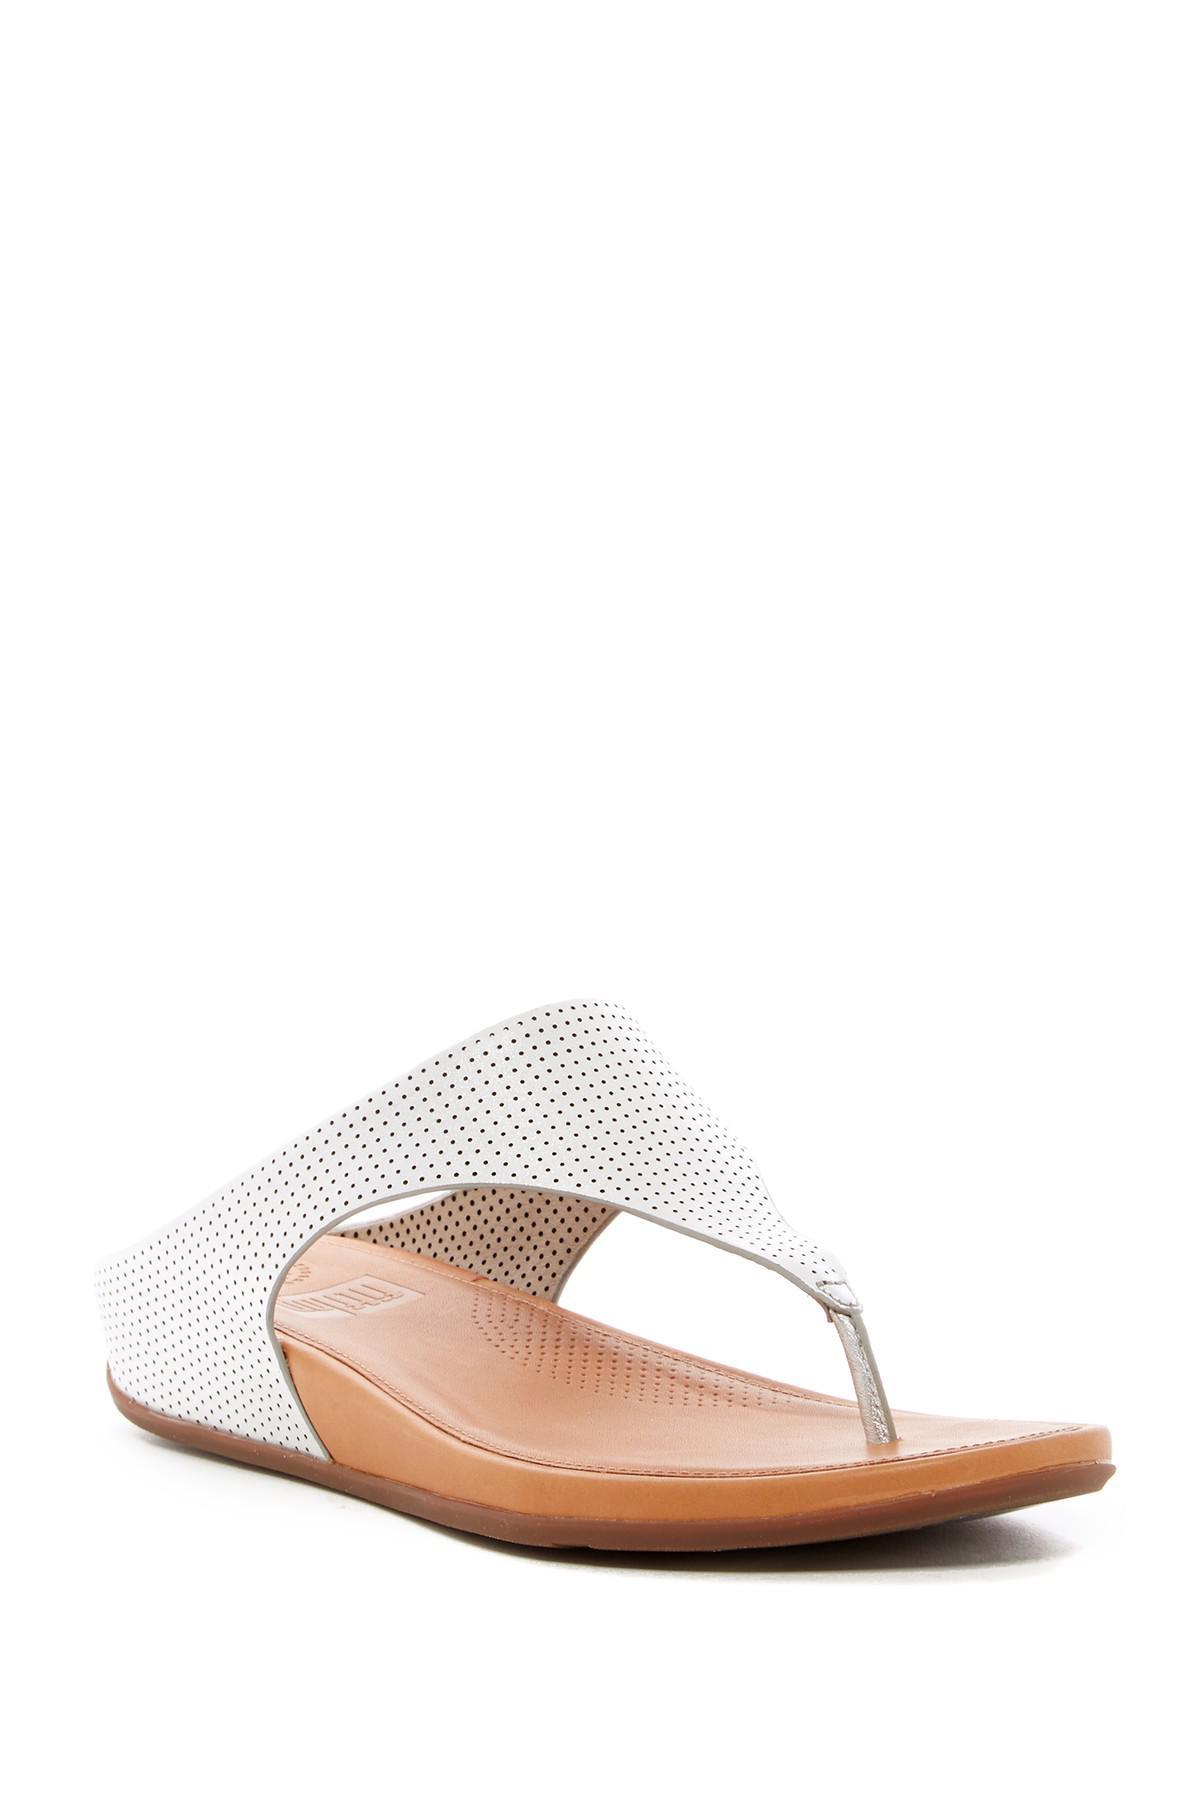 2b753d7d0 Lyst - Fitflop Banda Sandal in Metallic